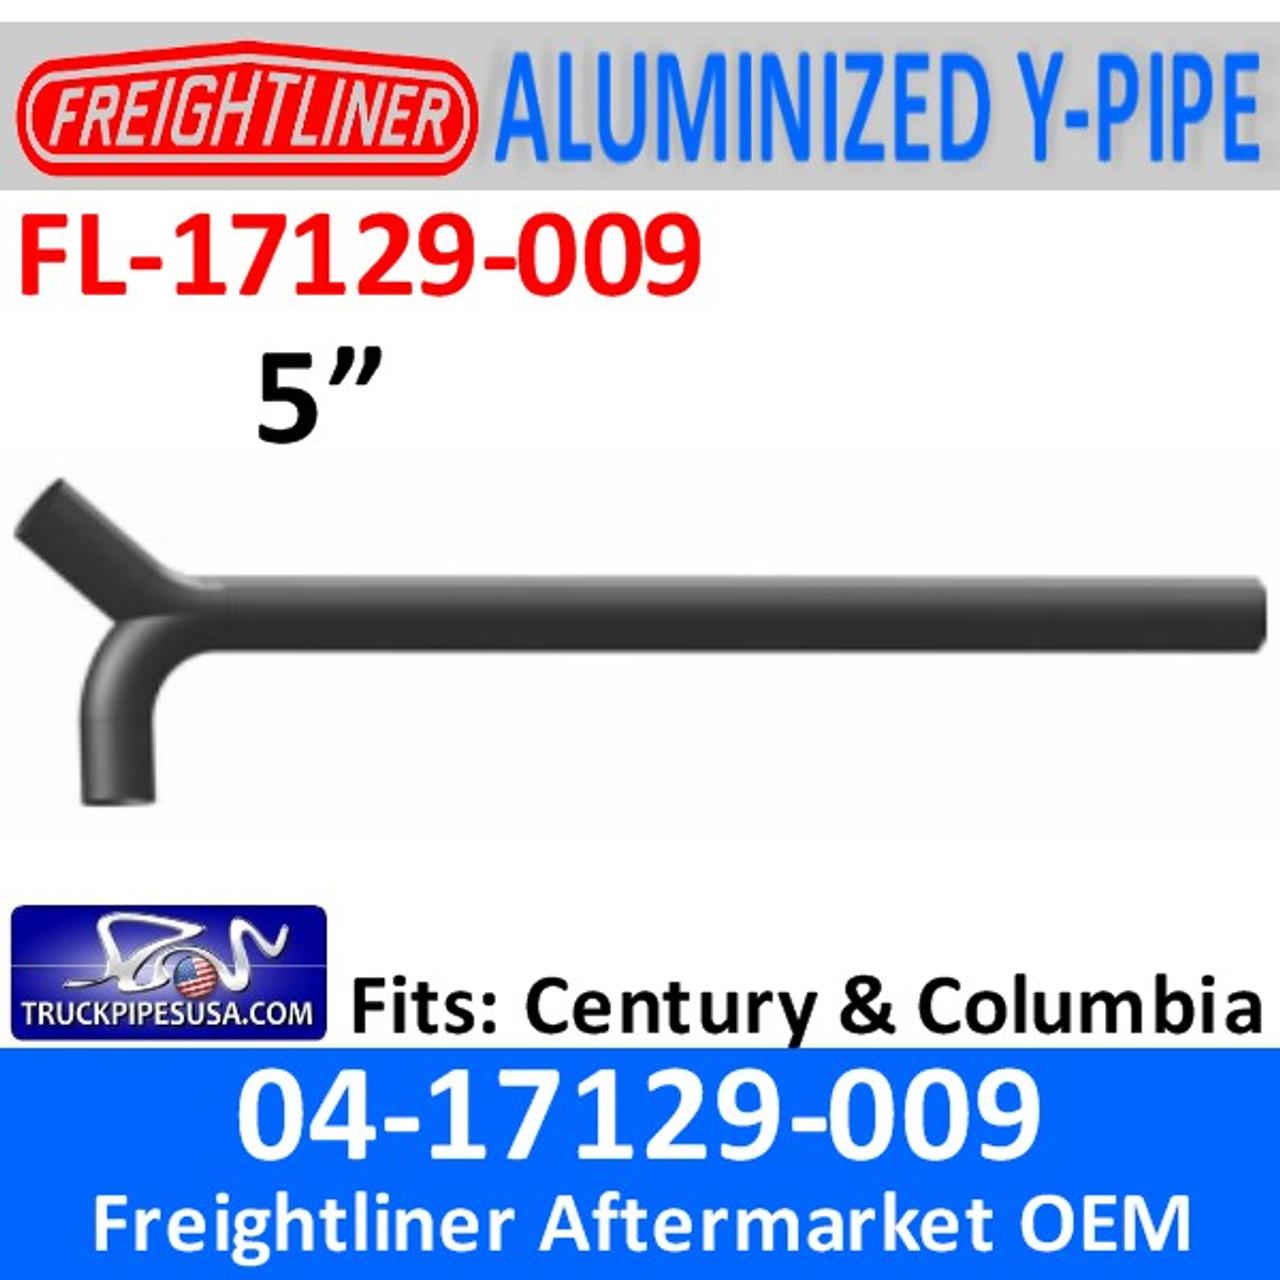 04-17129-009 Freightliner Century or Columbia Y-Pipe FL-17129-009